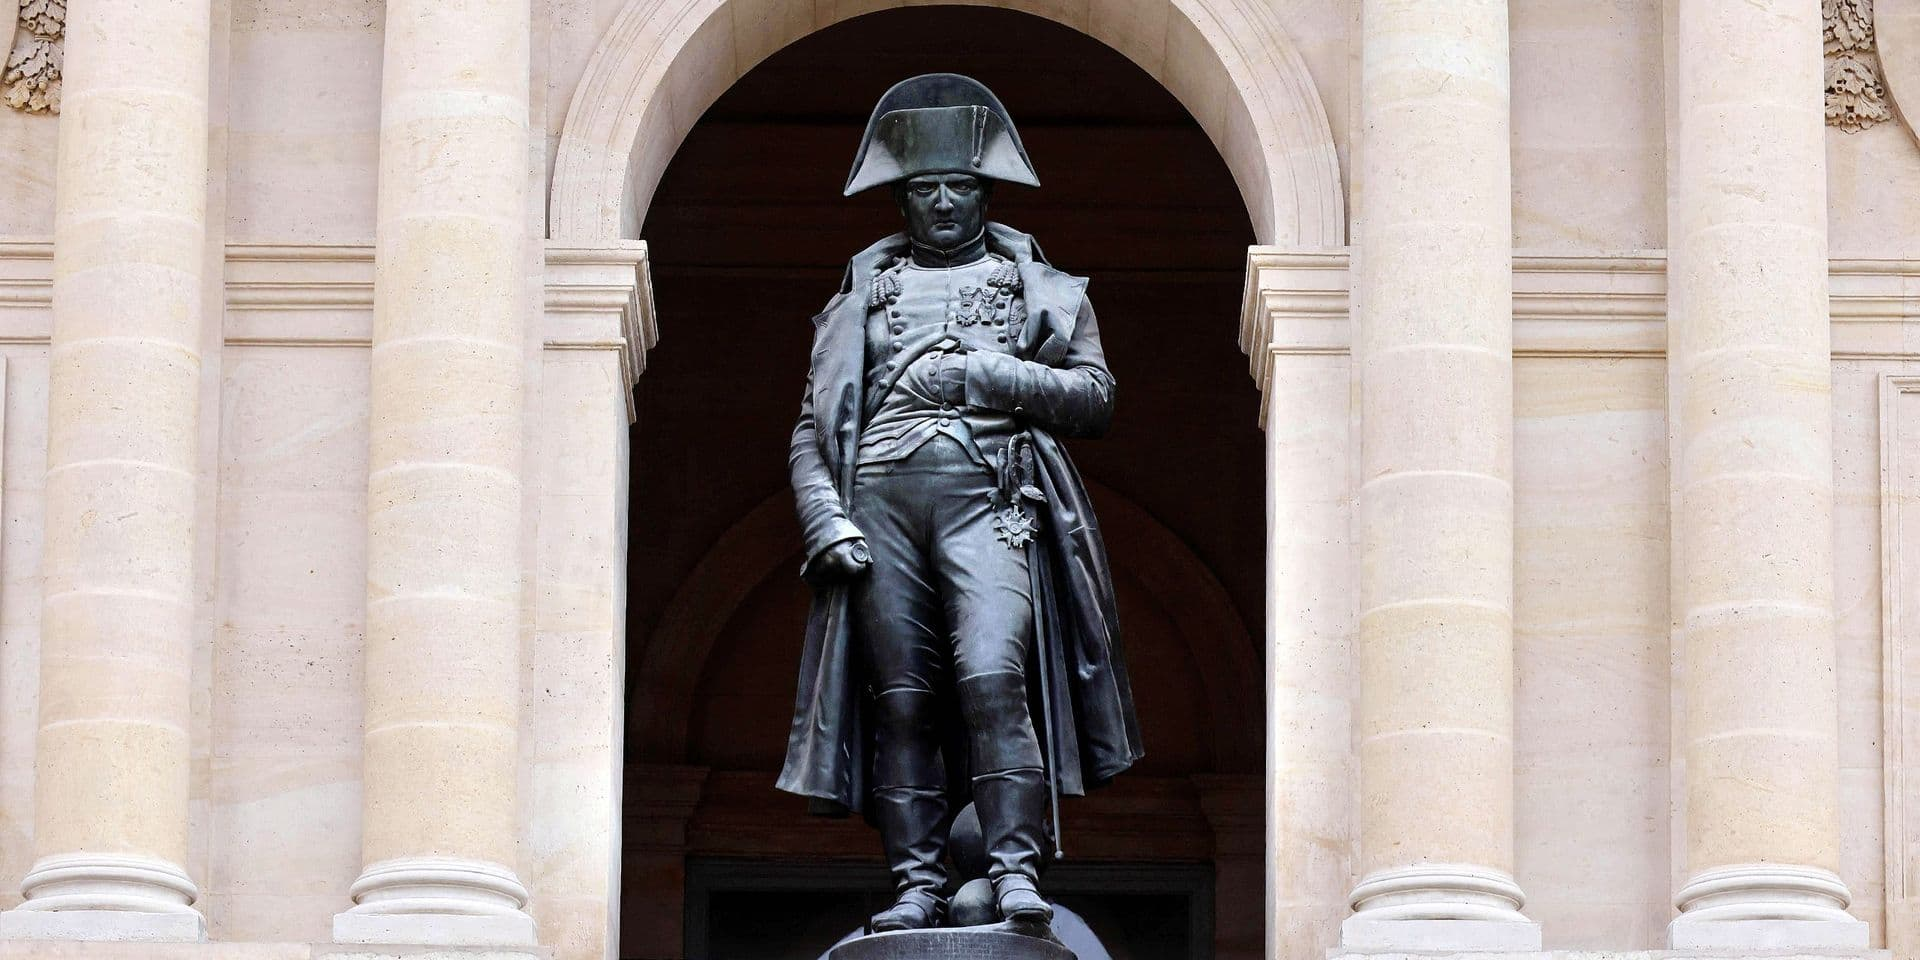 Génie ou tyran: faut-il célébrer Napoléon?